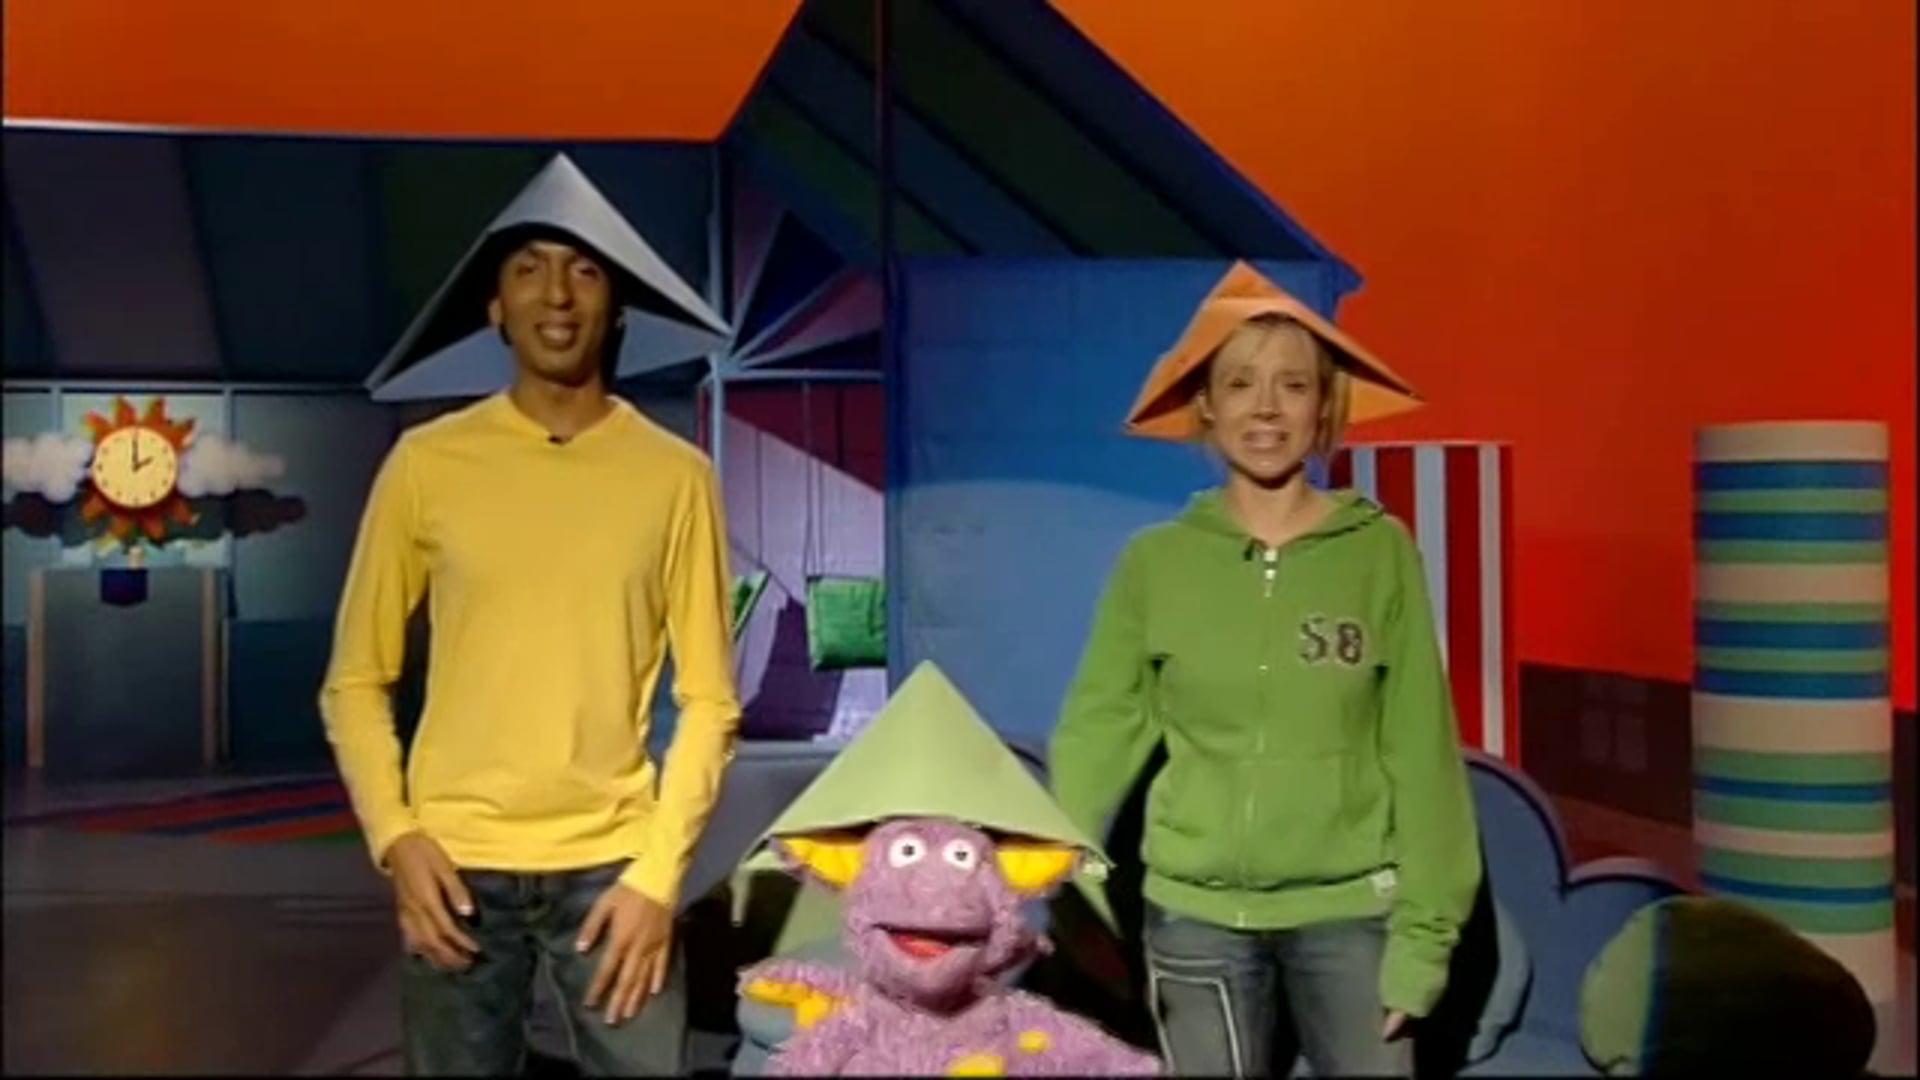 3 cornered hat hilarity